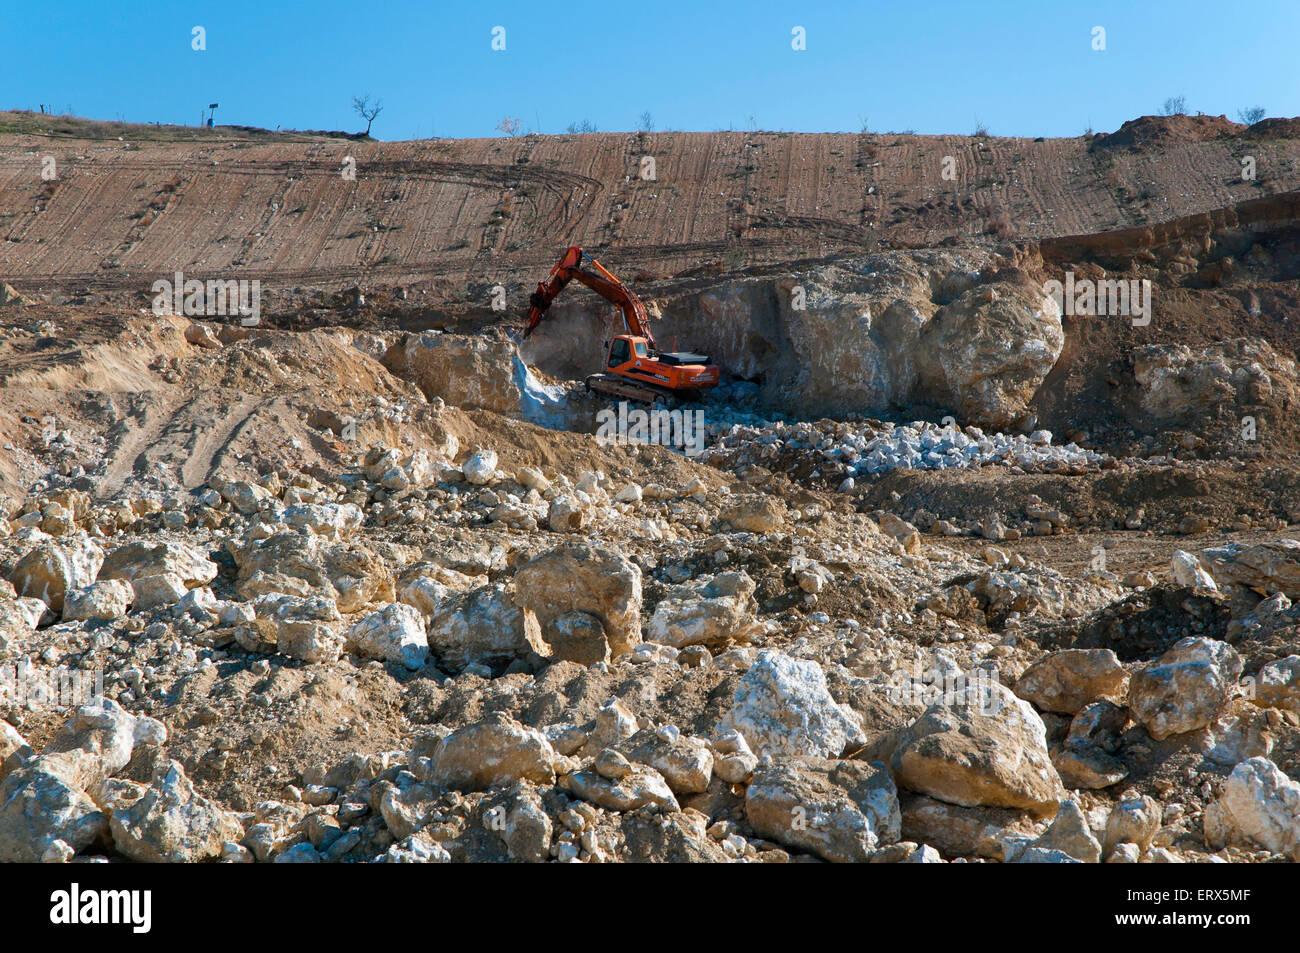 Celestine Mine, Escuzar, Granada province, Region of Andalusia, Spain, Europe - Stock Image